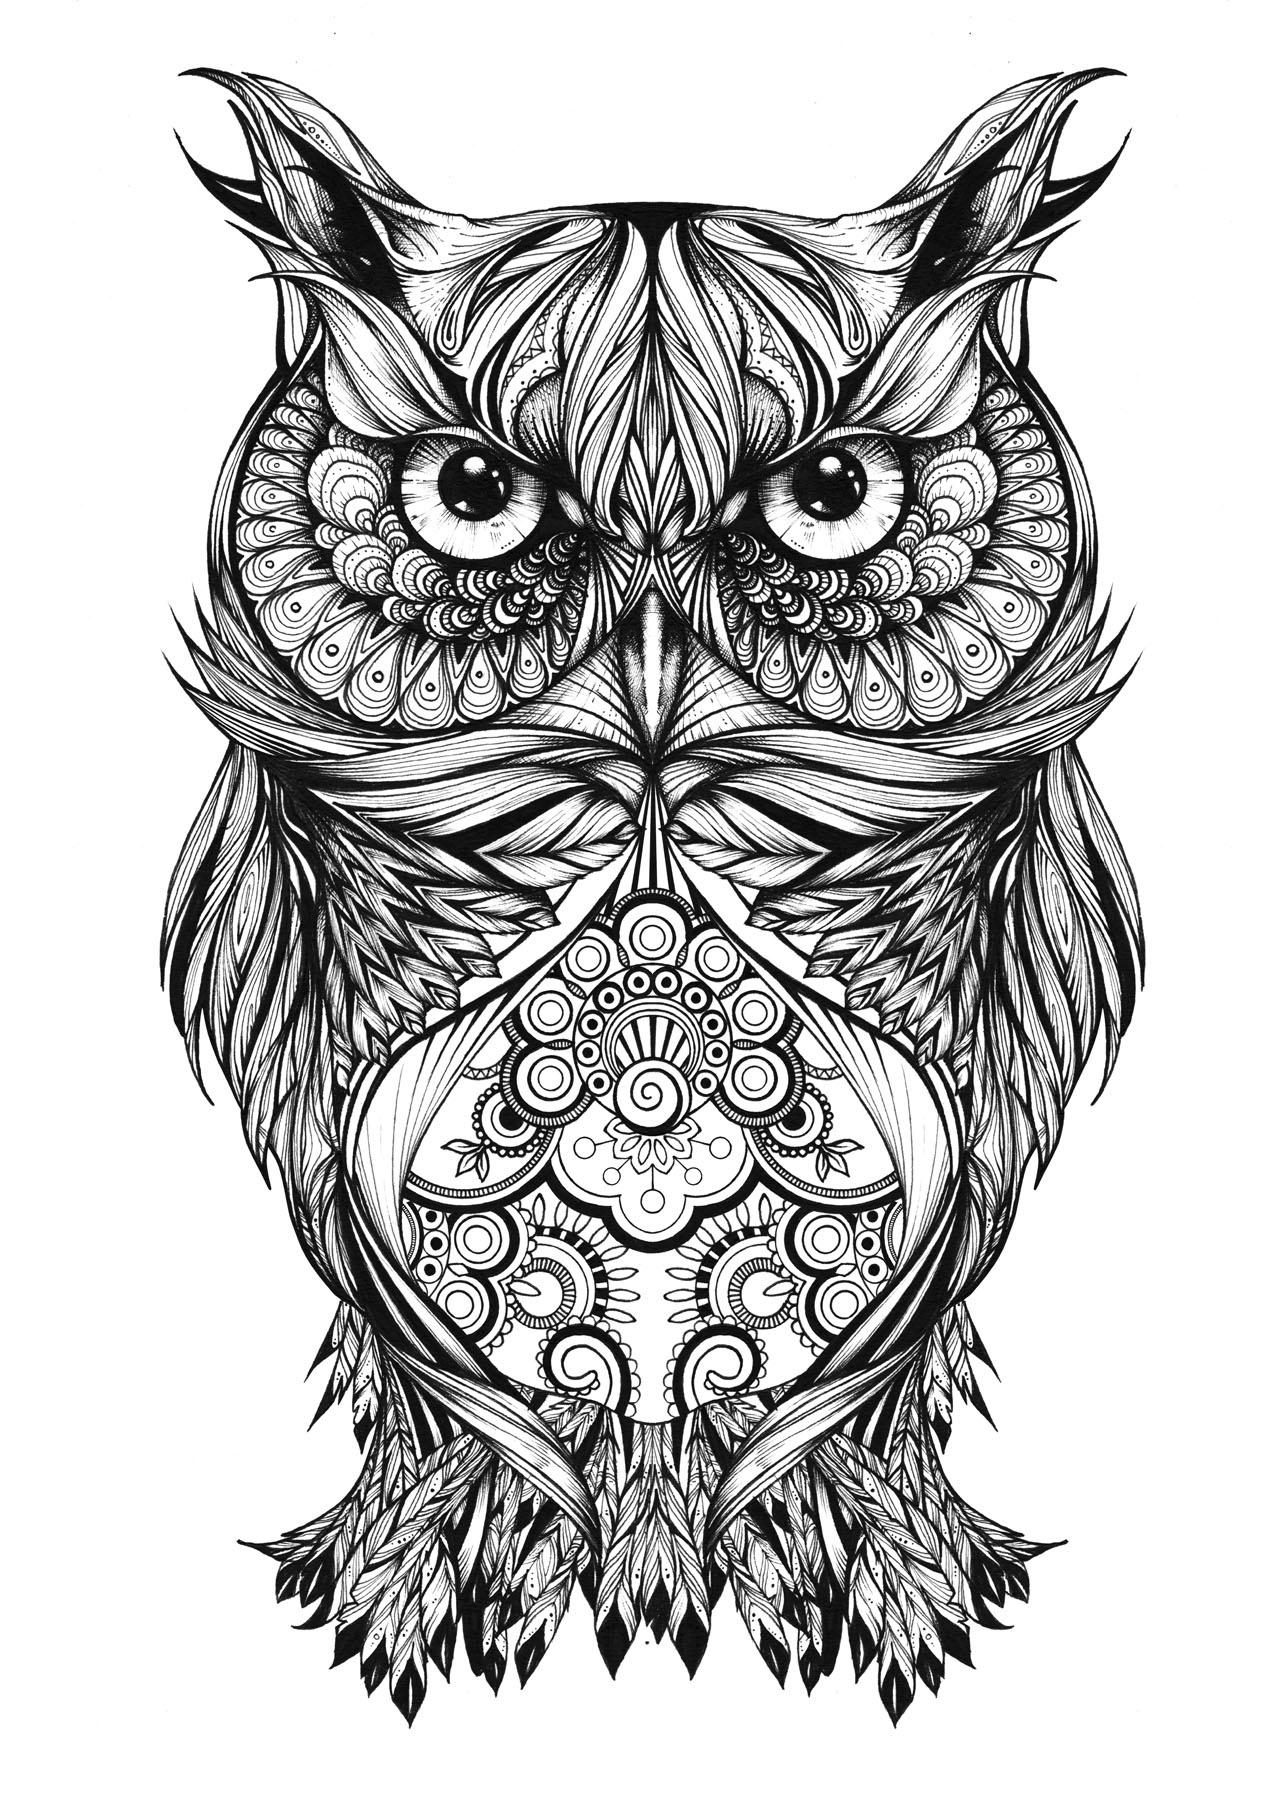 Decorative illustration of owl.